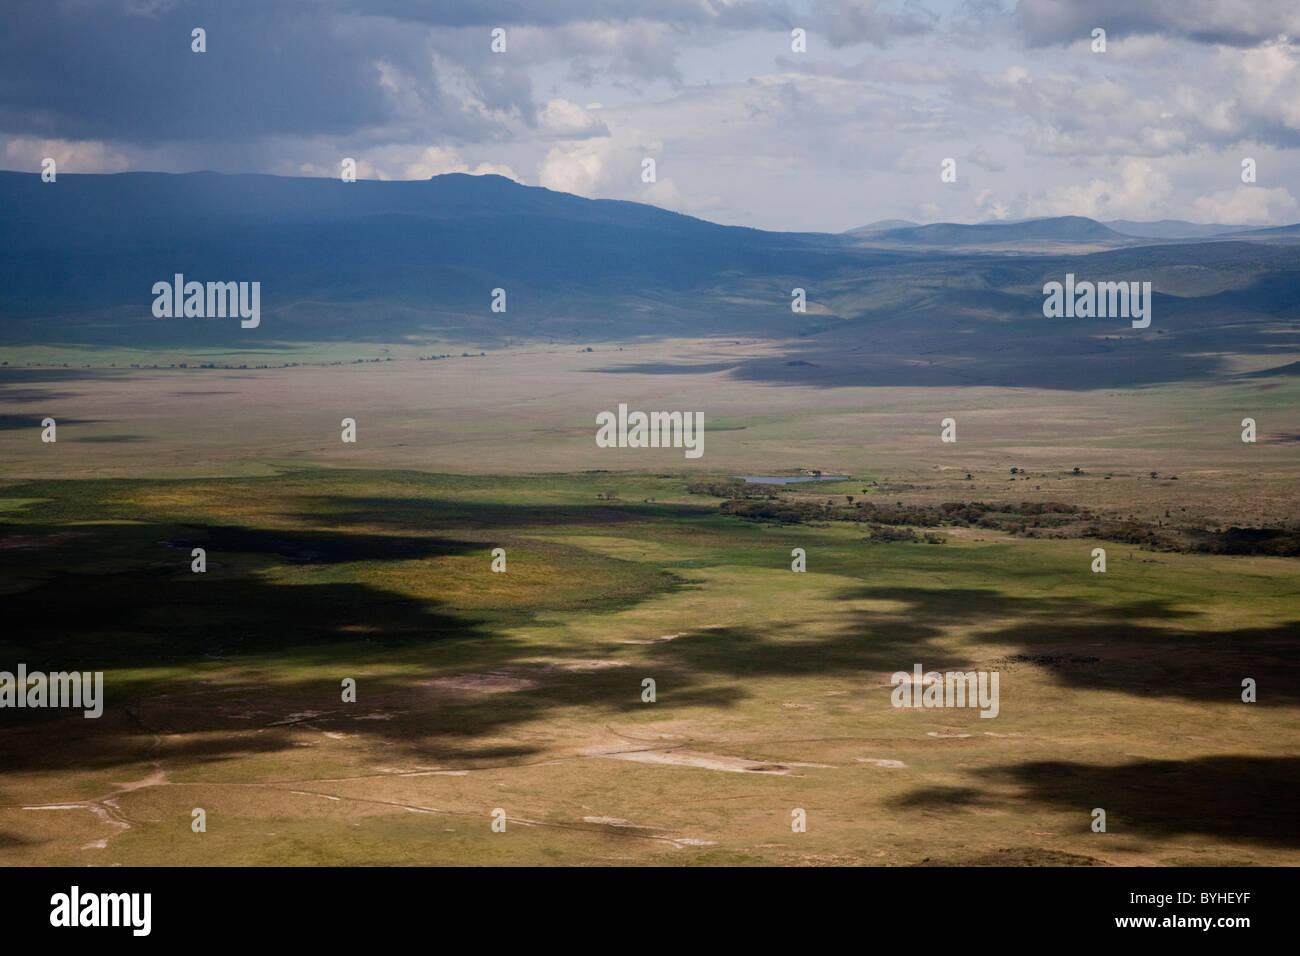 Great Rift Valley landscape, Tanzania, Africa Stock Photo